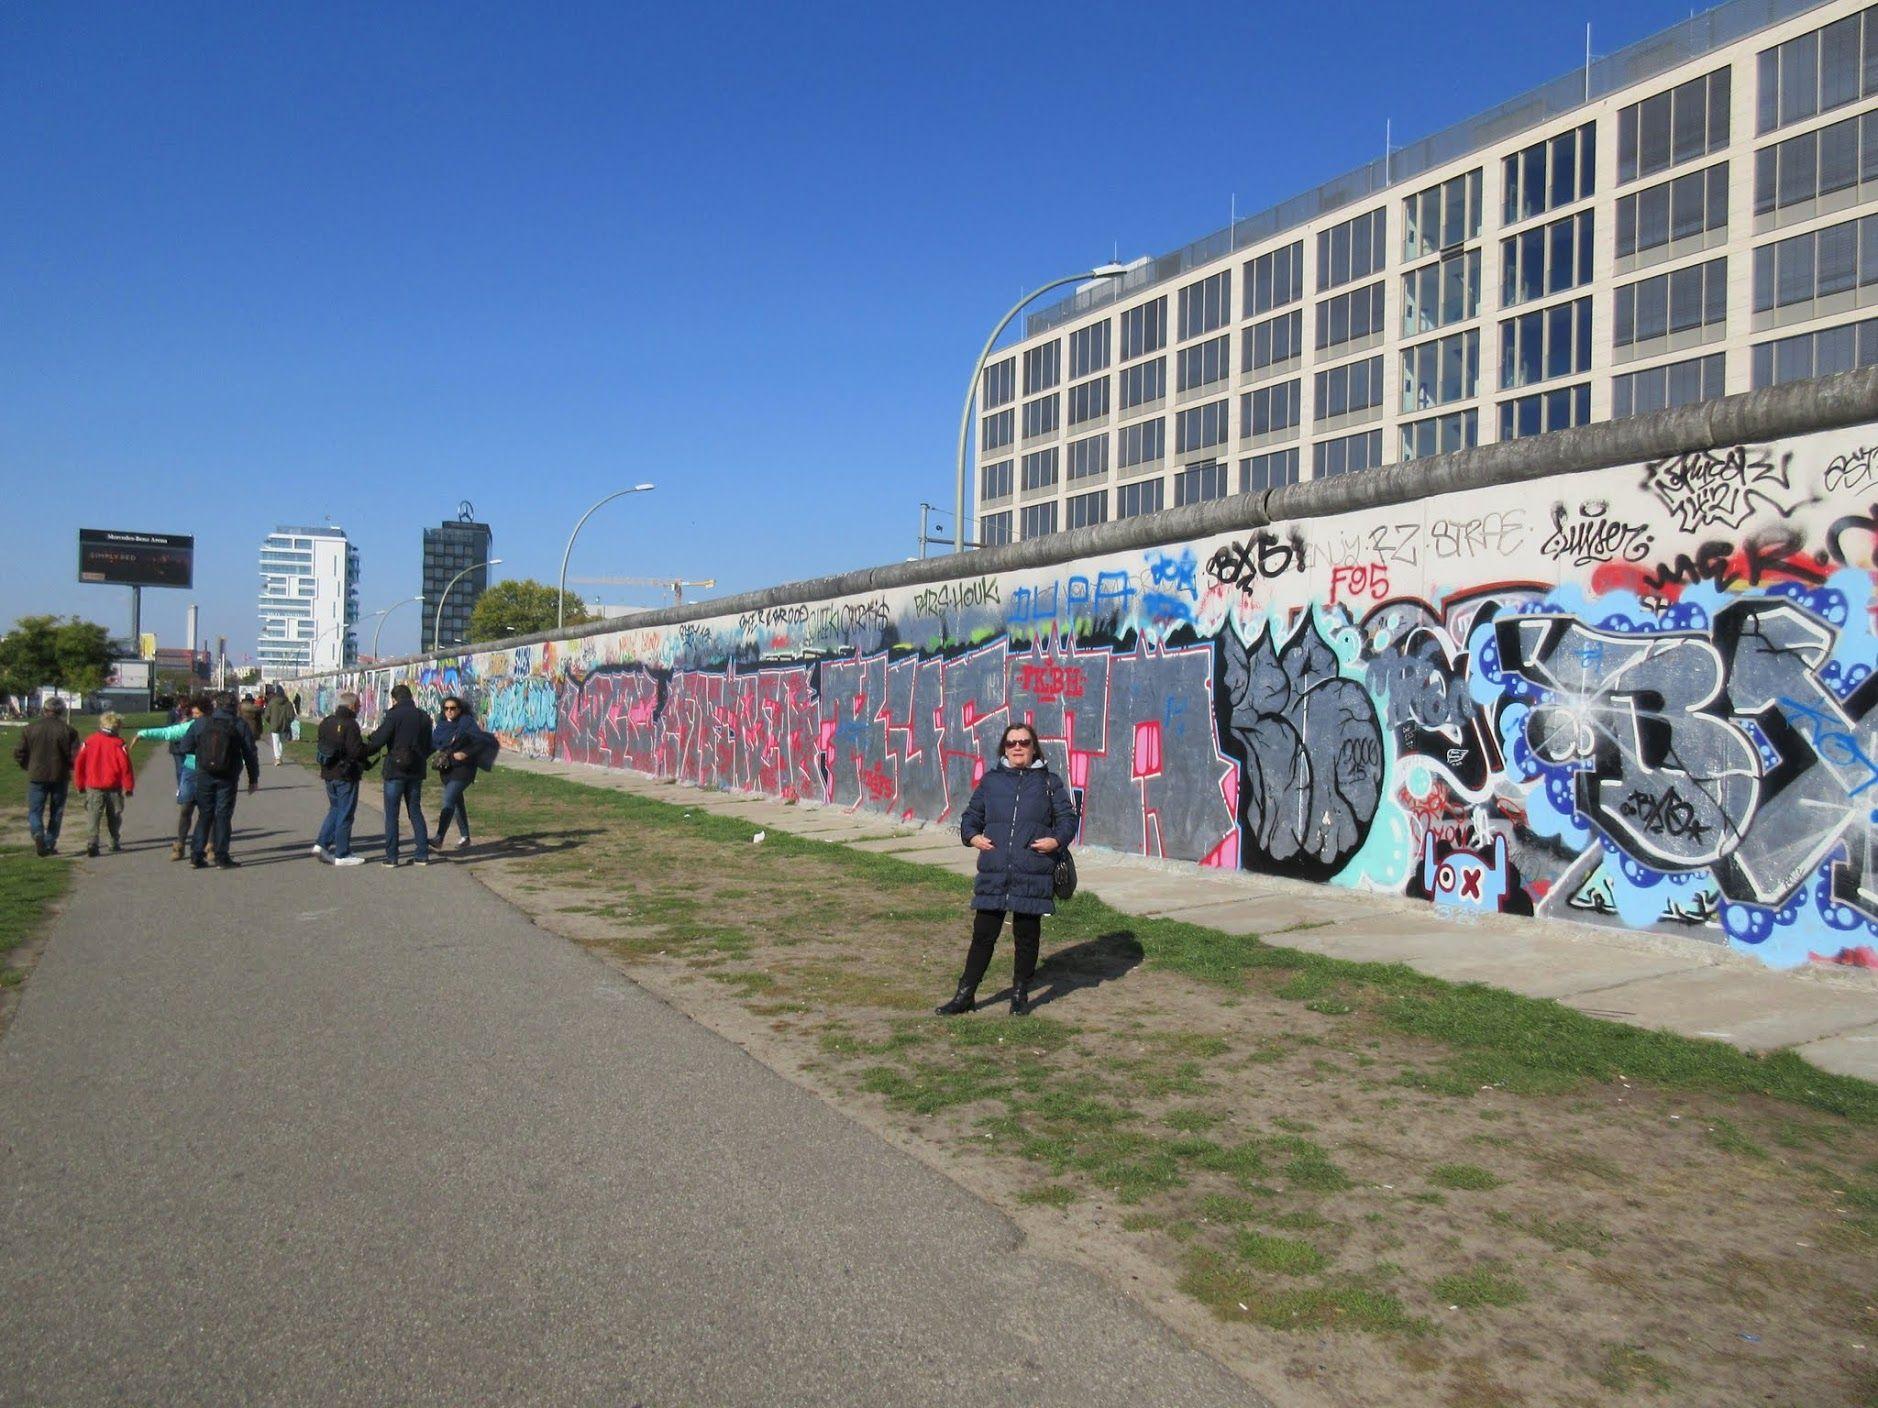 Billede i Berlin oktober 2015 - Google Fotos